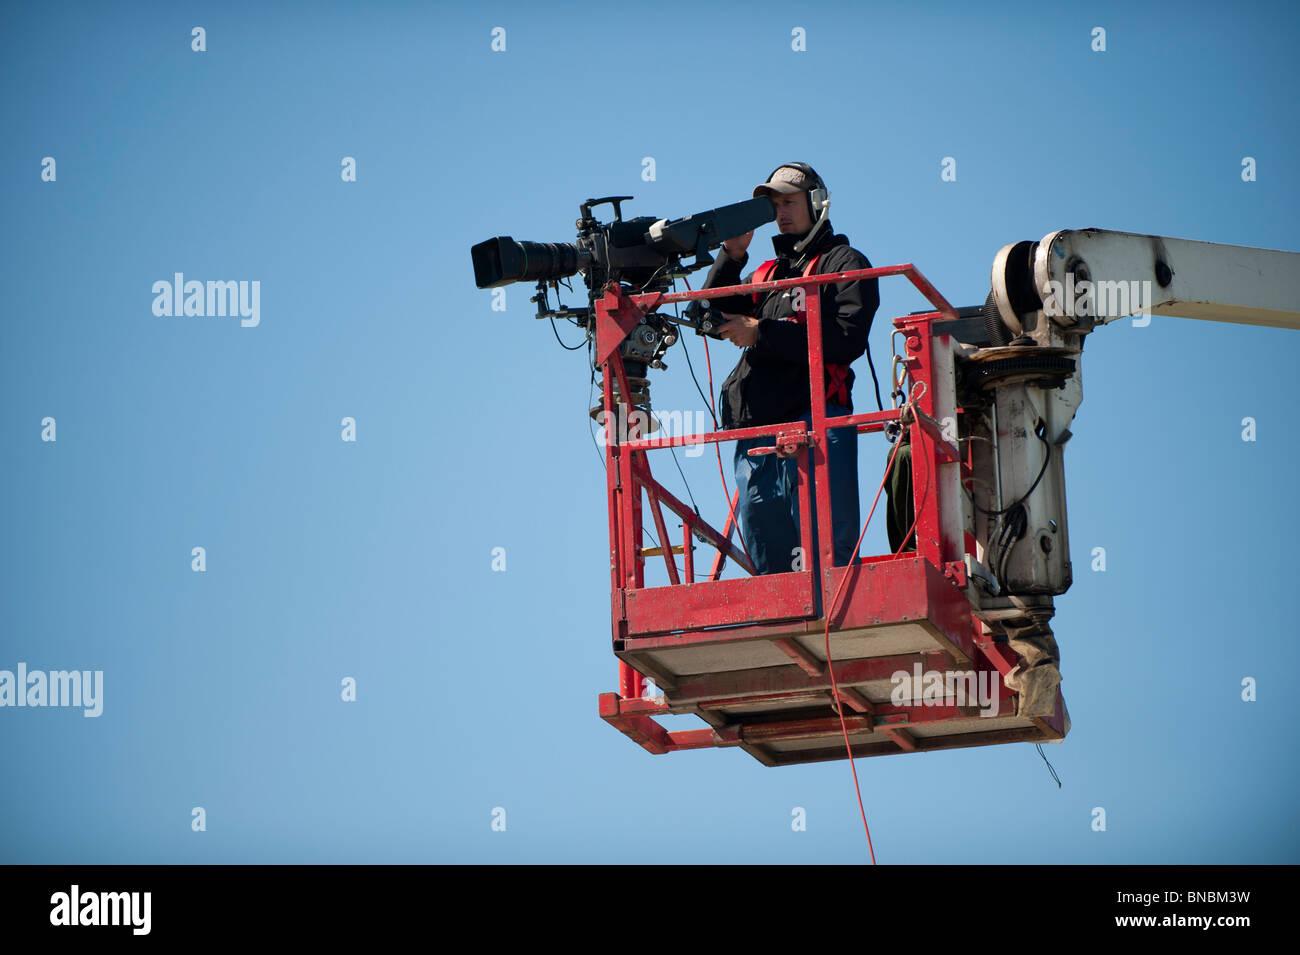 Broadcast TV cameraman on elevated platform, UK - Stock Image